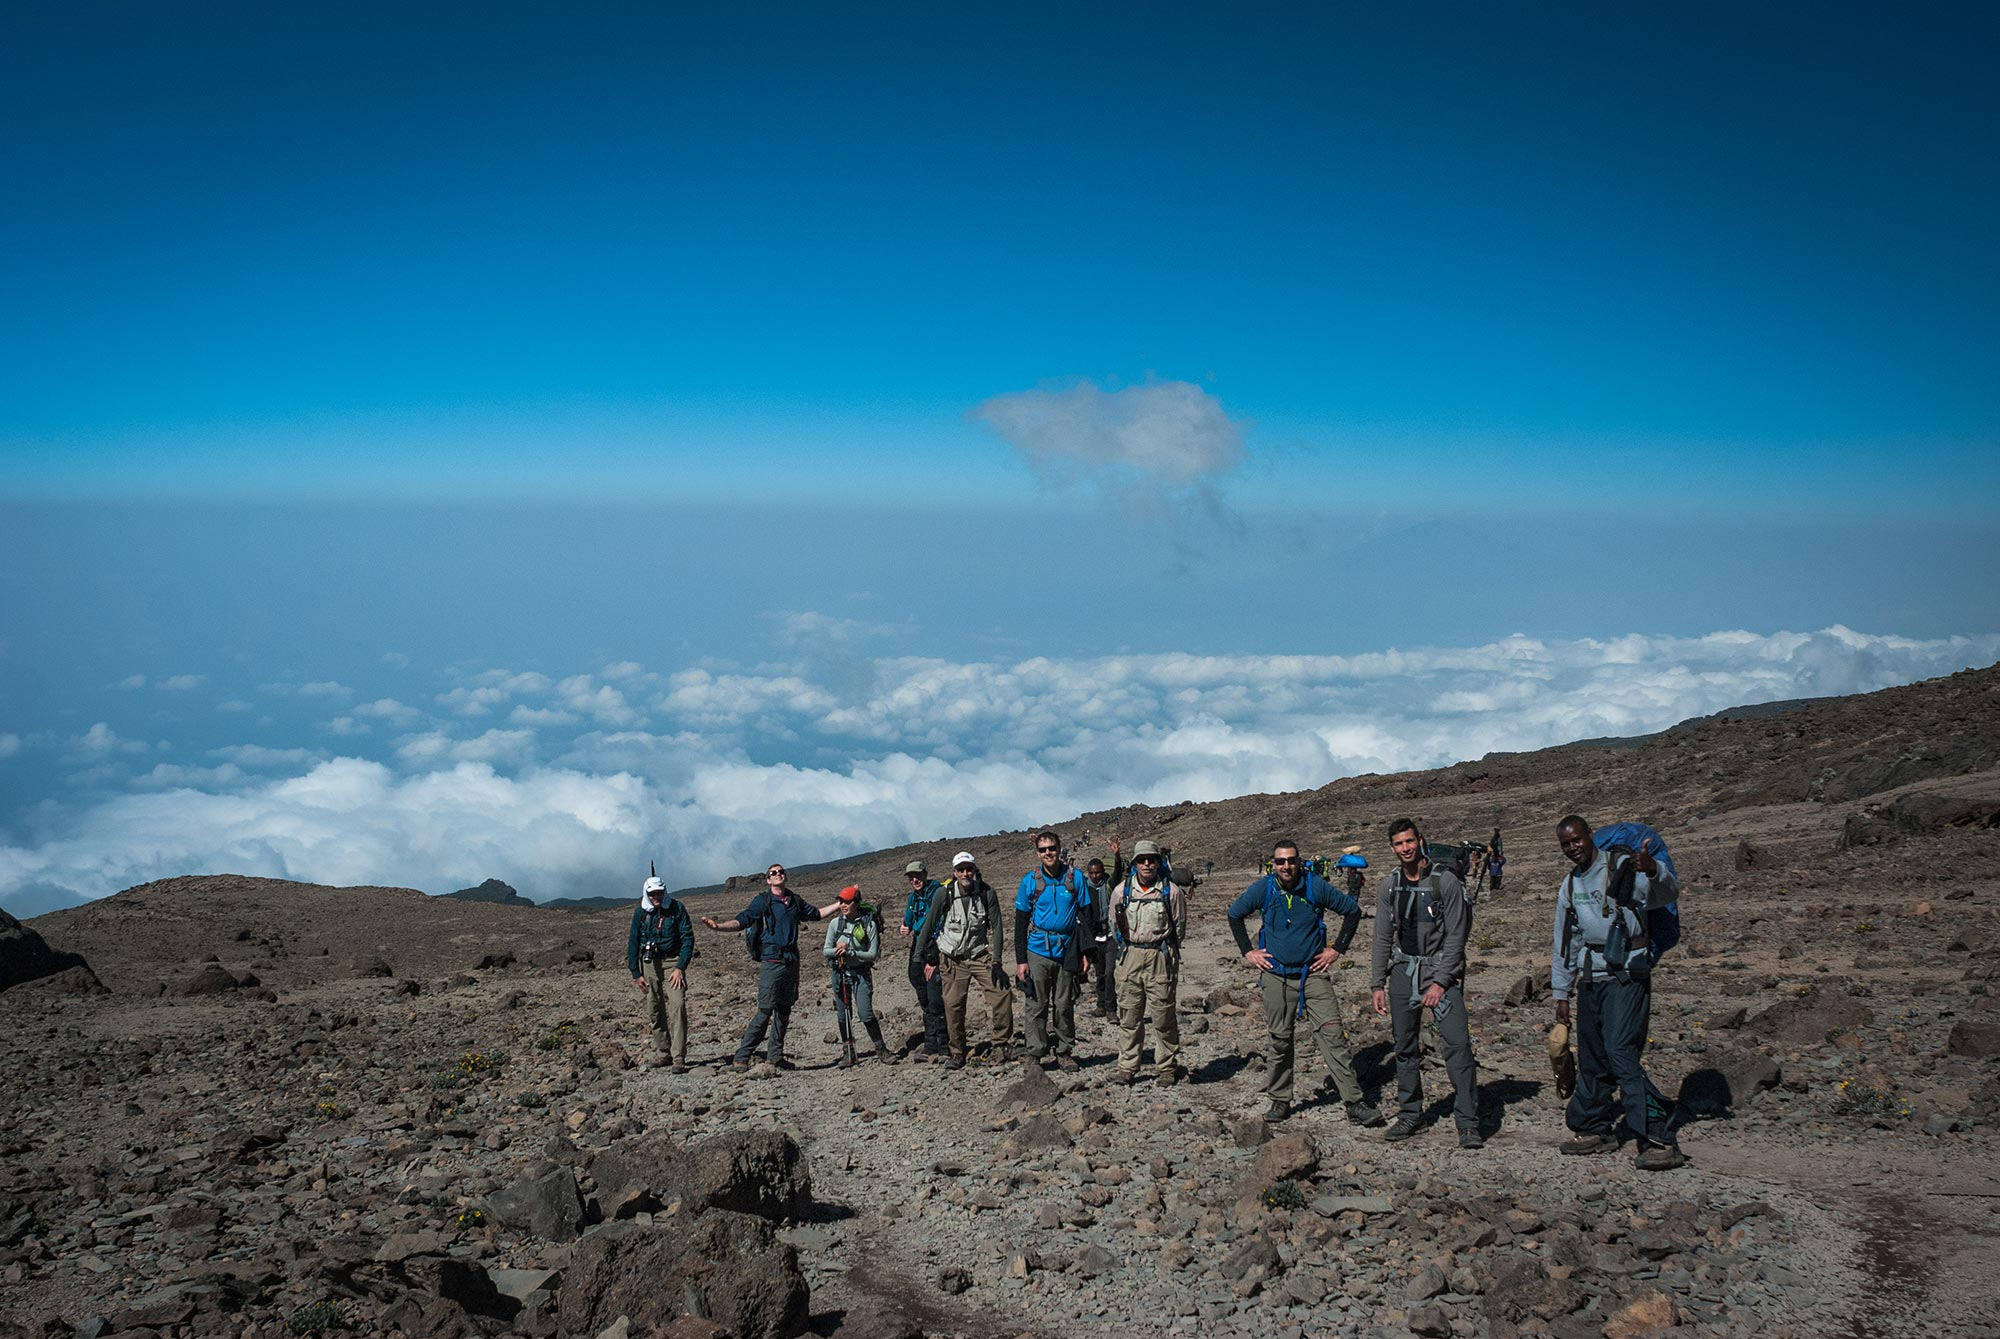 D6-29-team-photo-karanga-to-barufu-camp-kilimanjaro.jpg